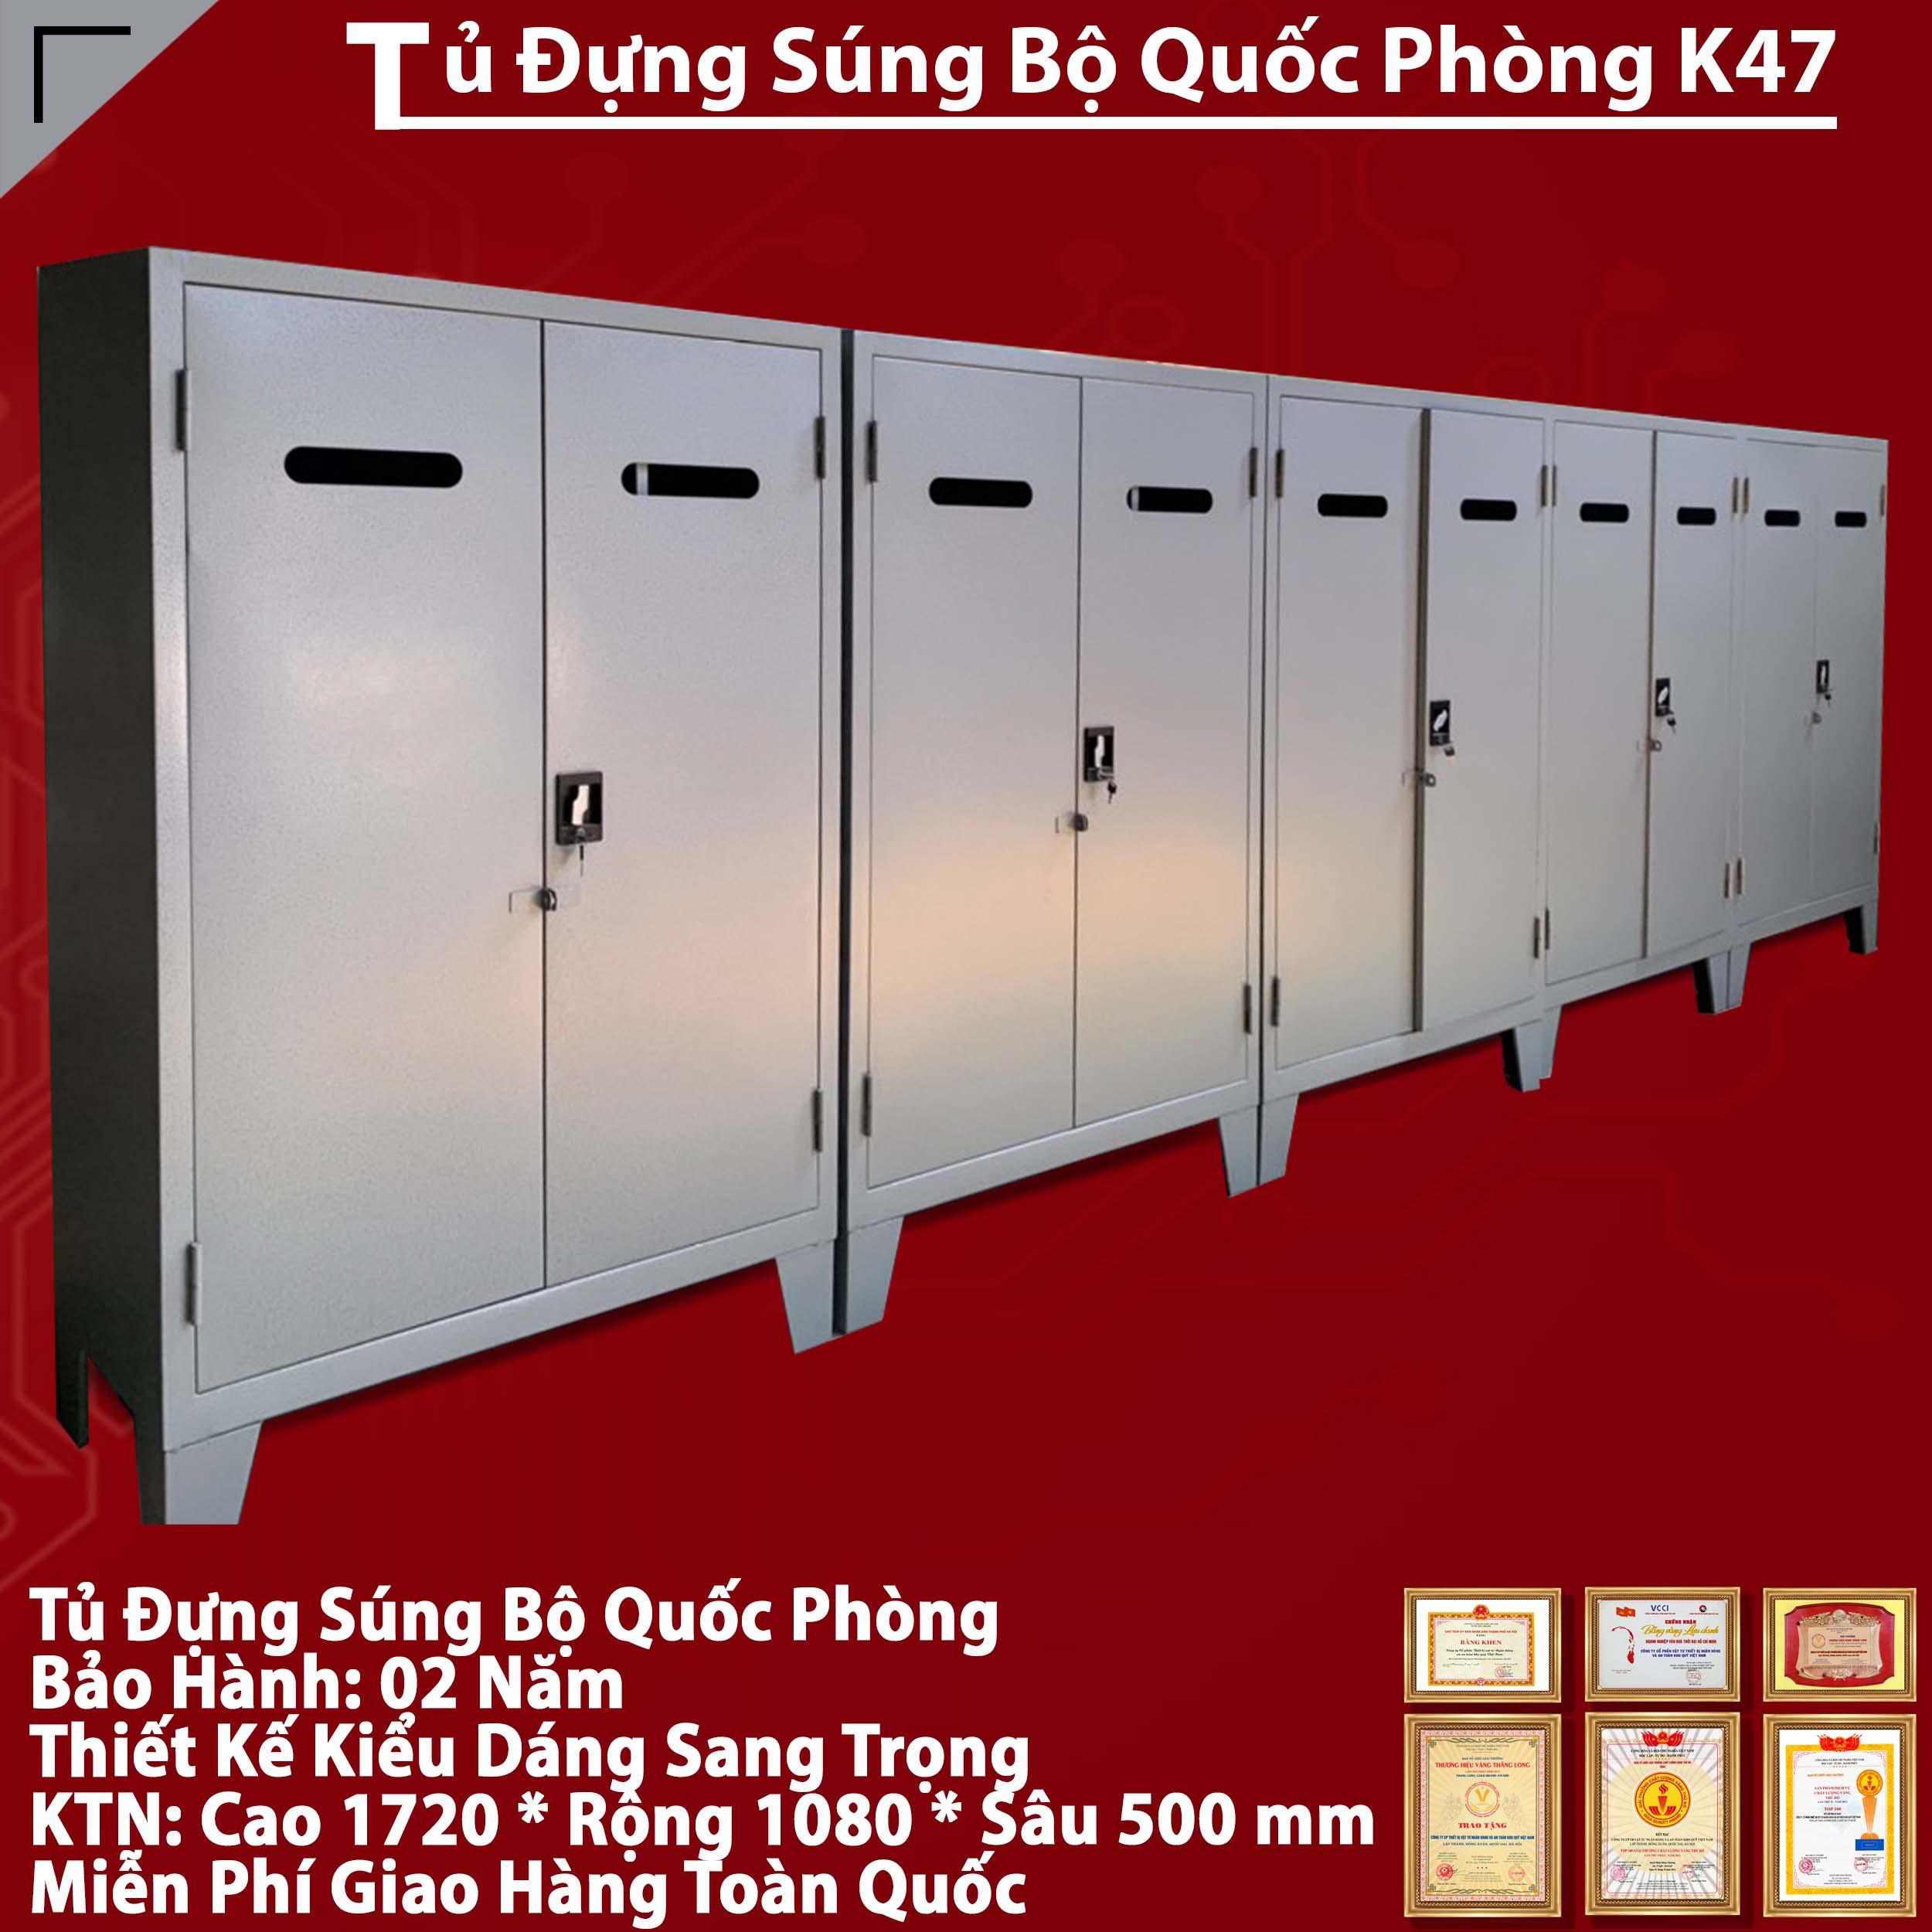 Thiet Bi Quoc Phong